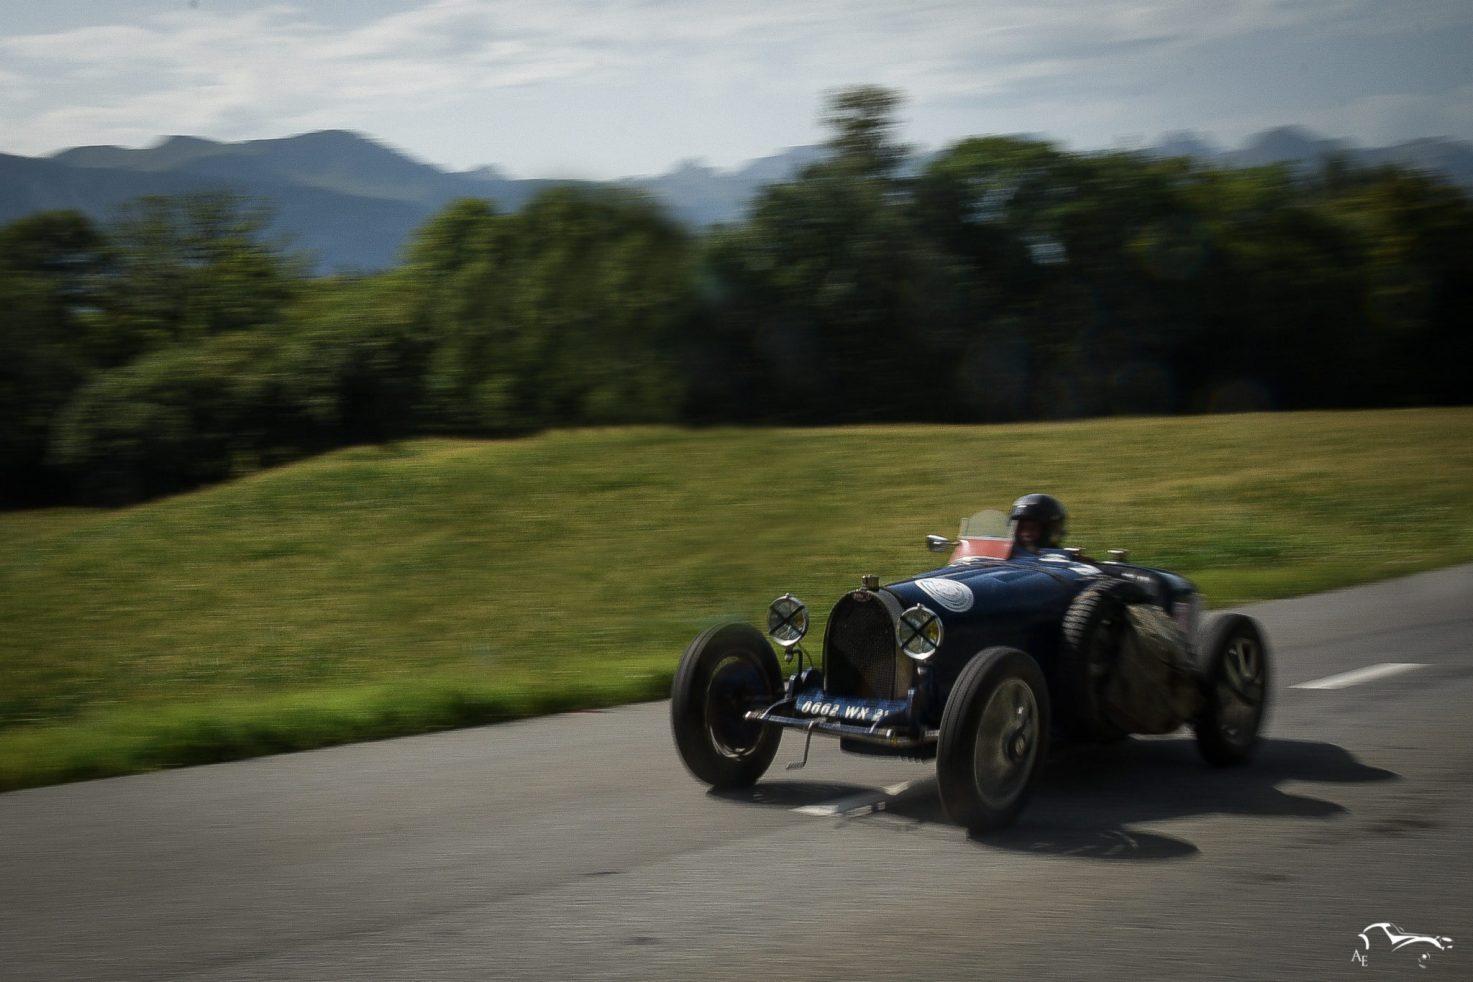 Bugatti T51 2300 cc 19311, replica by Pur Sang Argentina (RA)